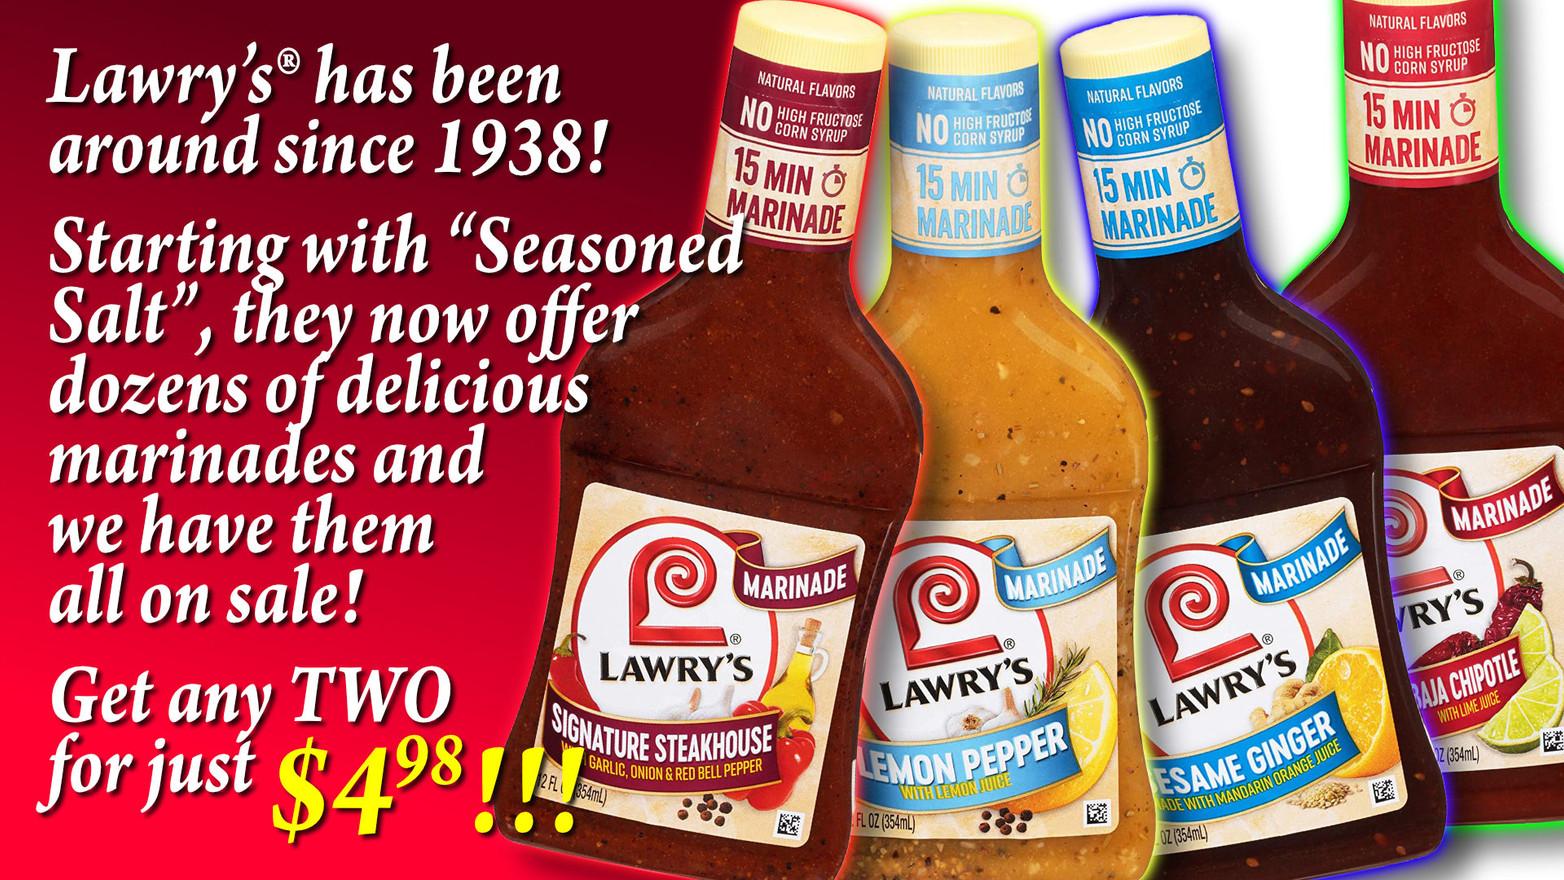 lawry's promo.jpg